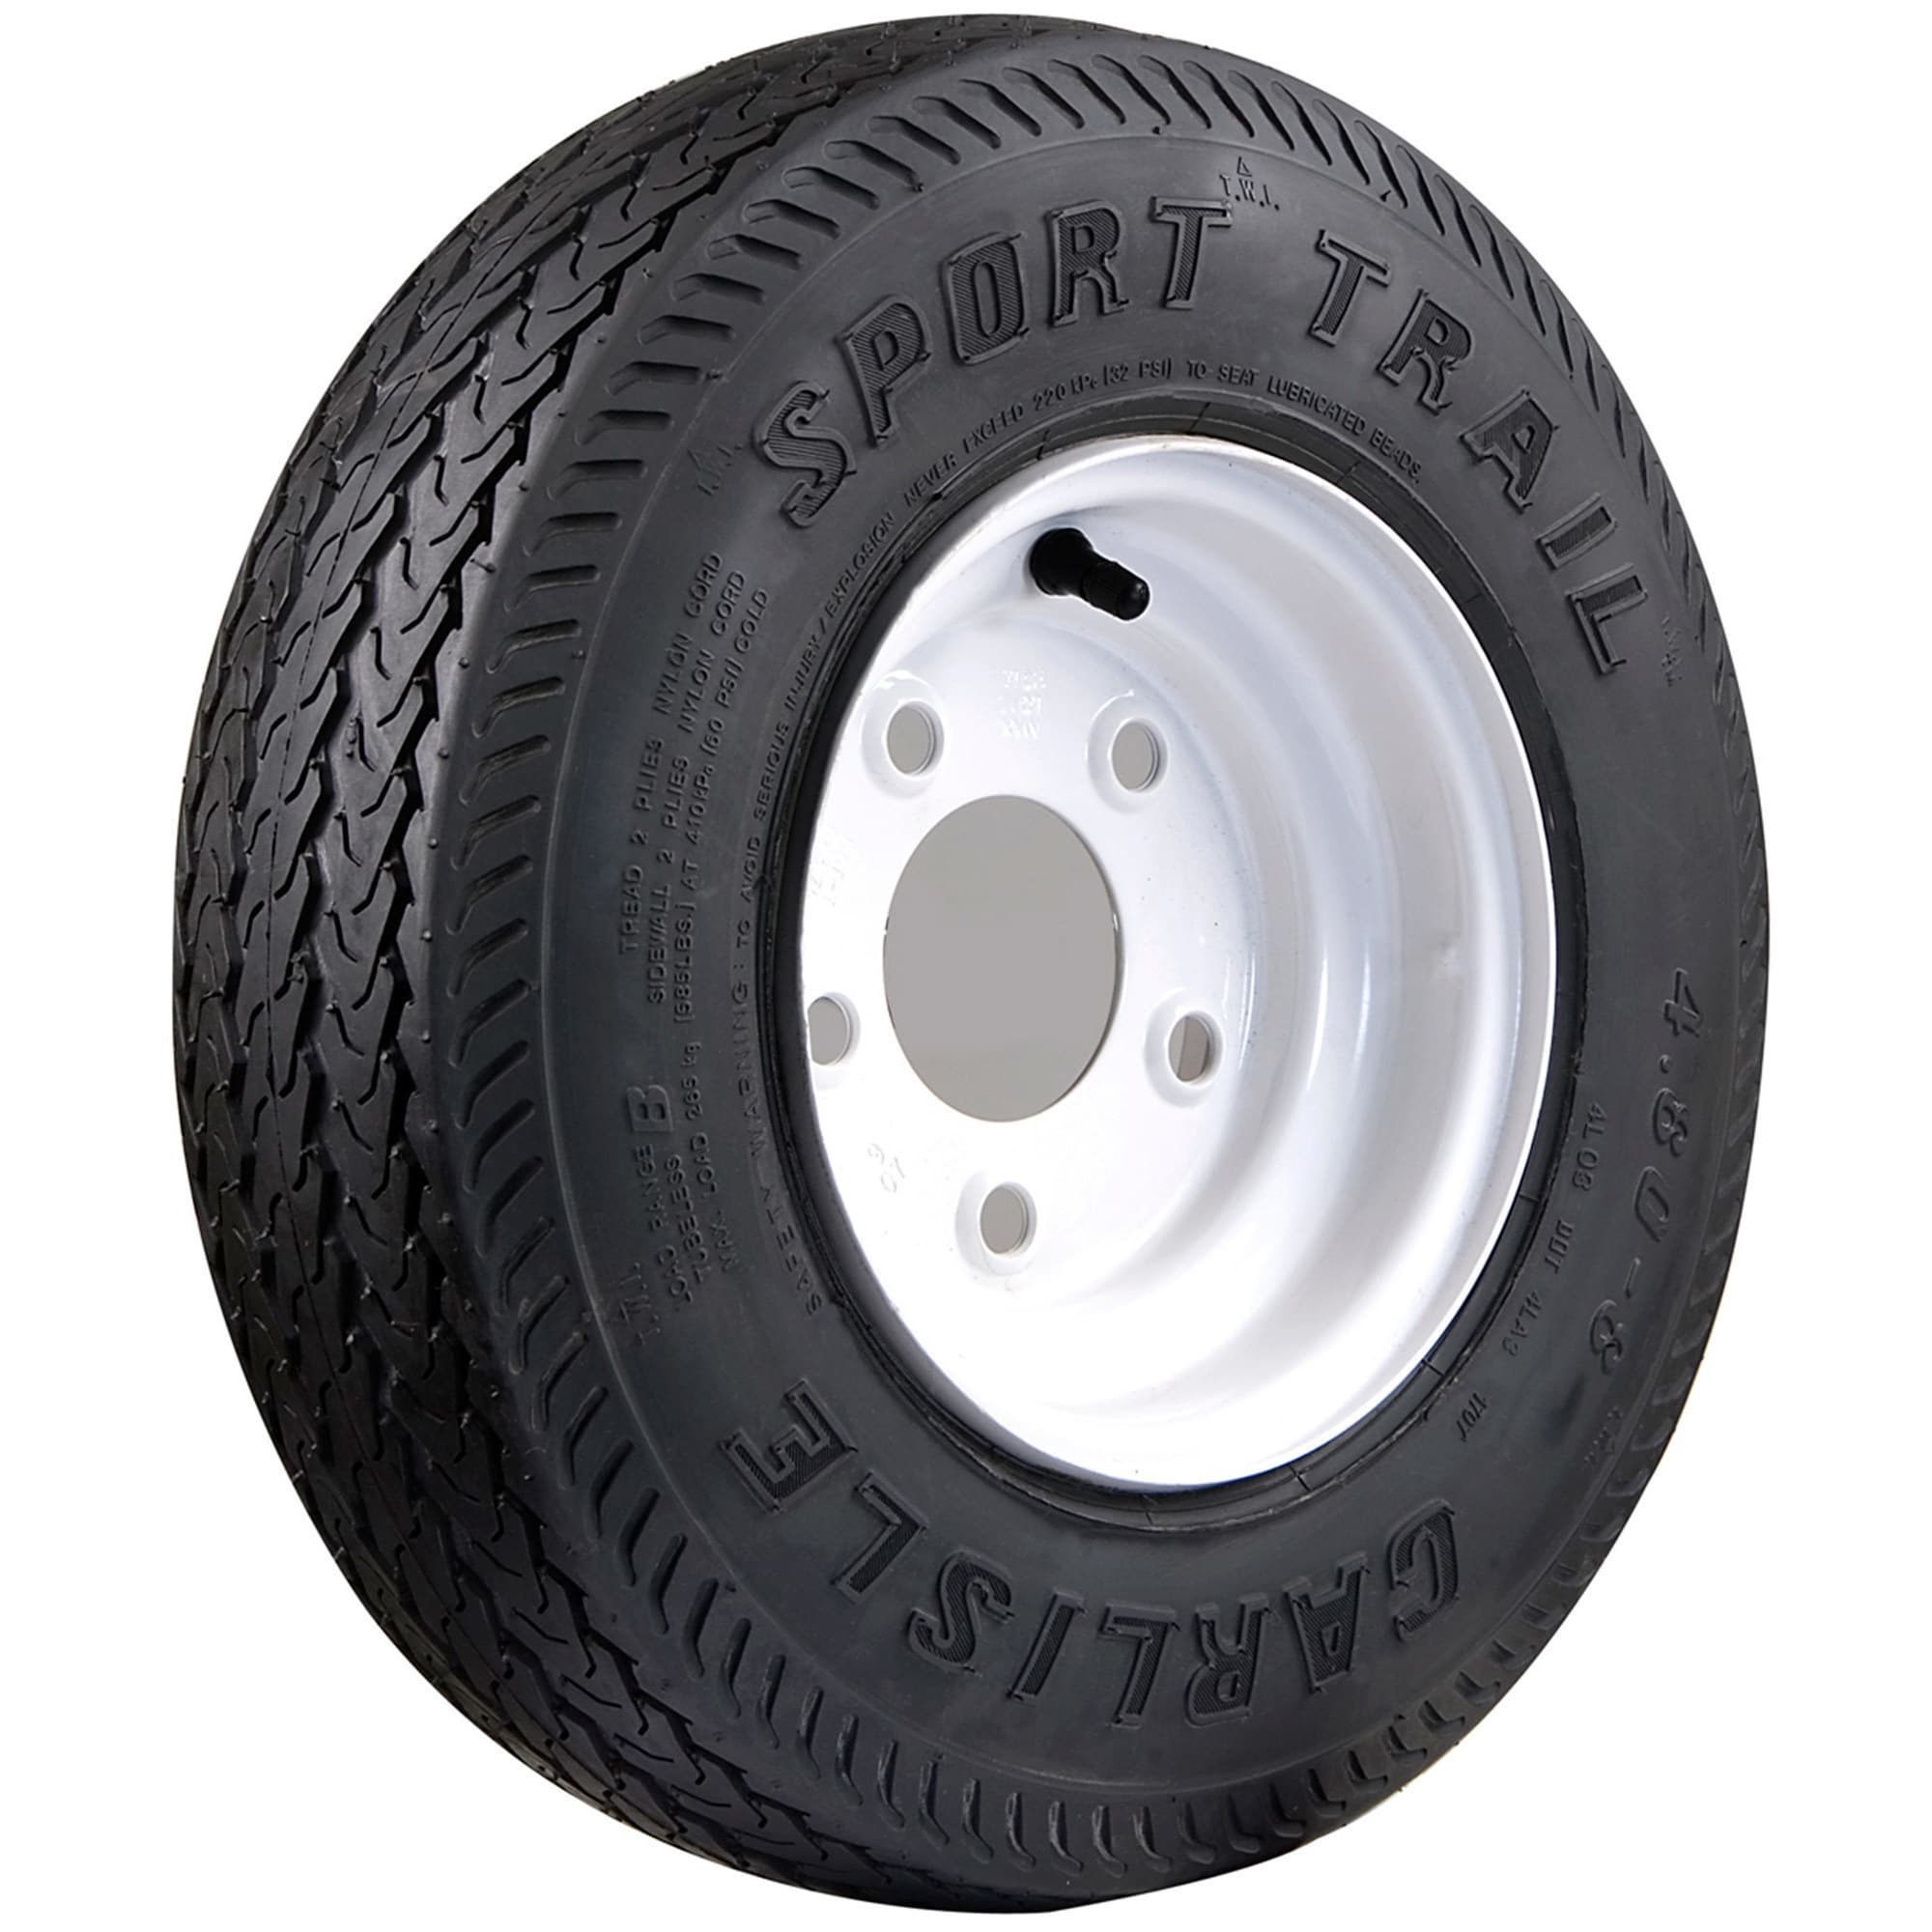 Carlisle Sport Trail Bias Trailer Tire - 20.5/8.0-10 LRD/...